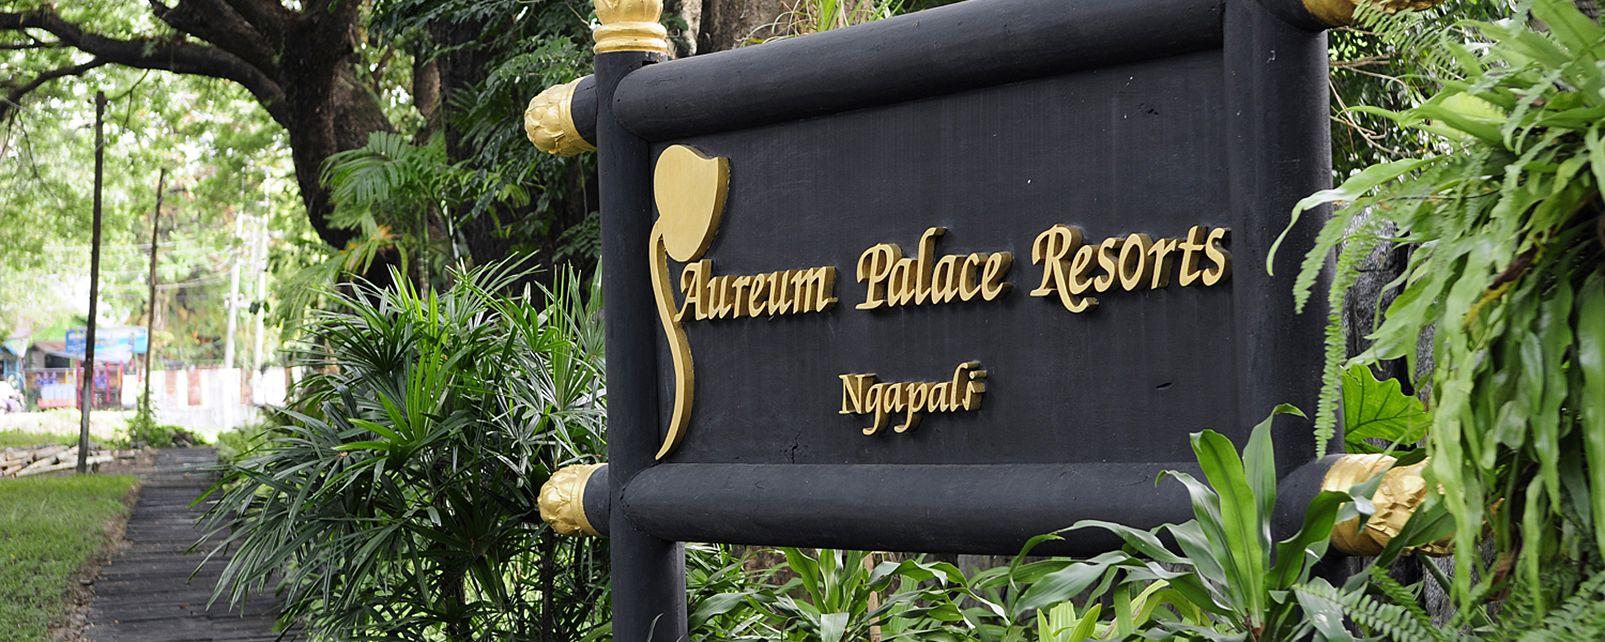 Hôtel Aureum Palace Resort & Spa Ngapali